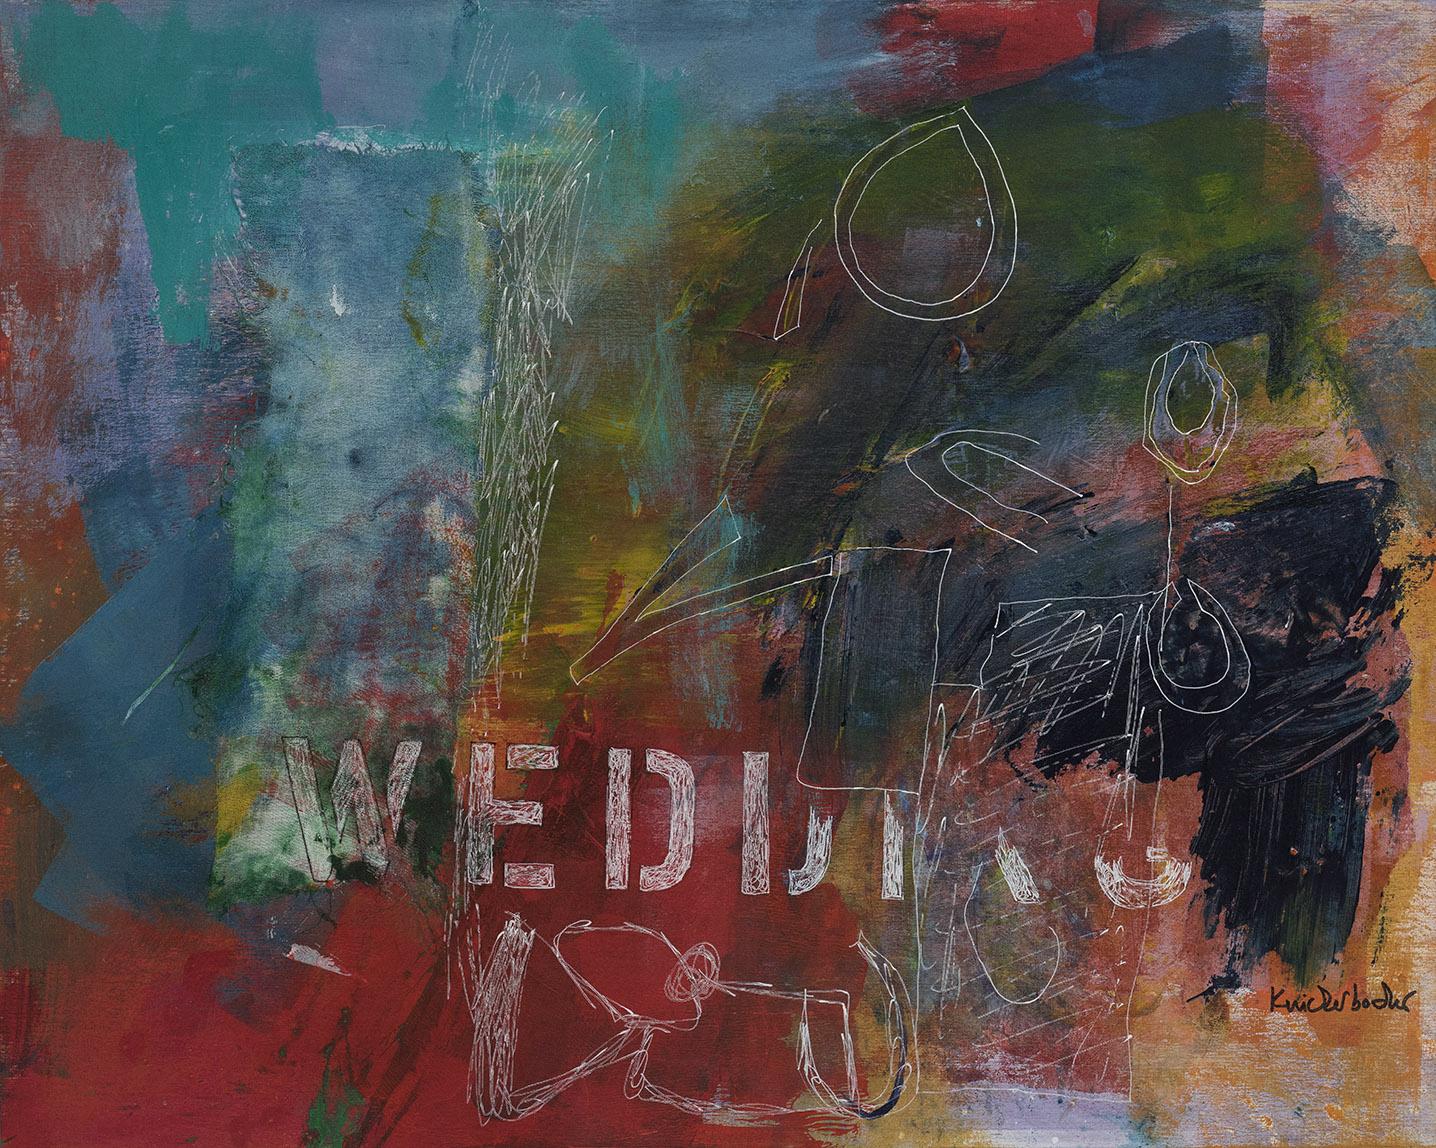 Ann Knickerbocker, Wedding, mixed media,16x20